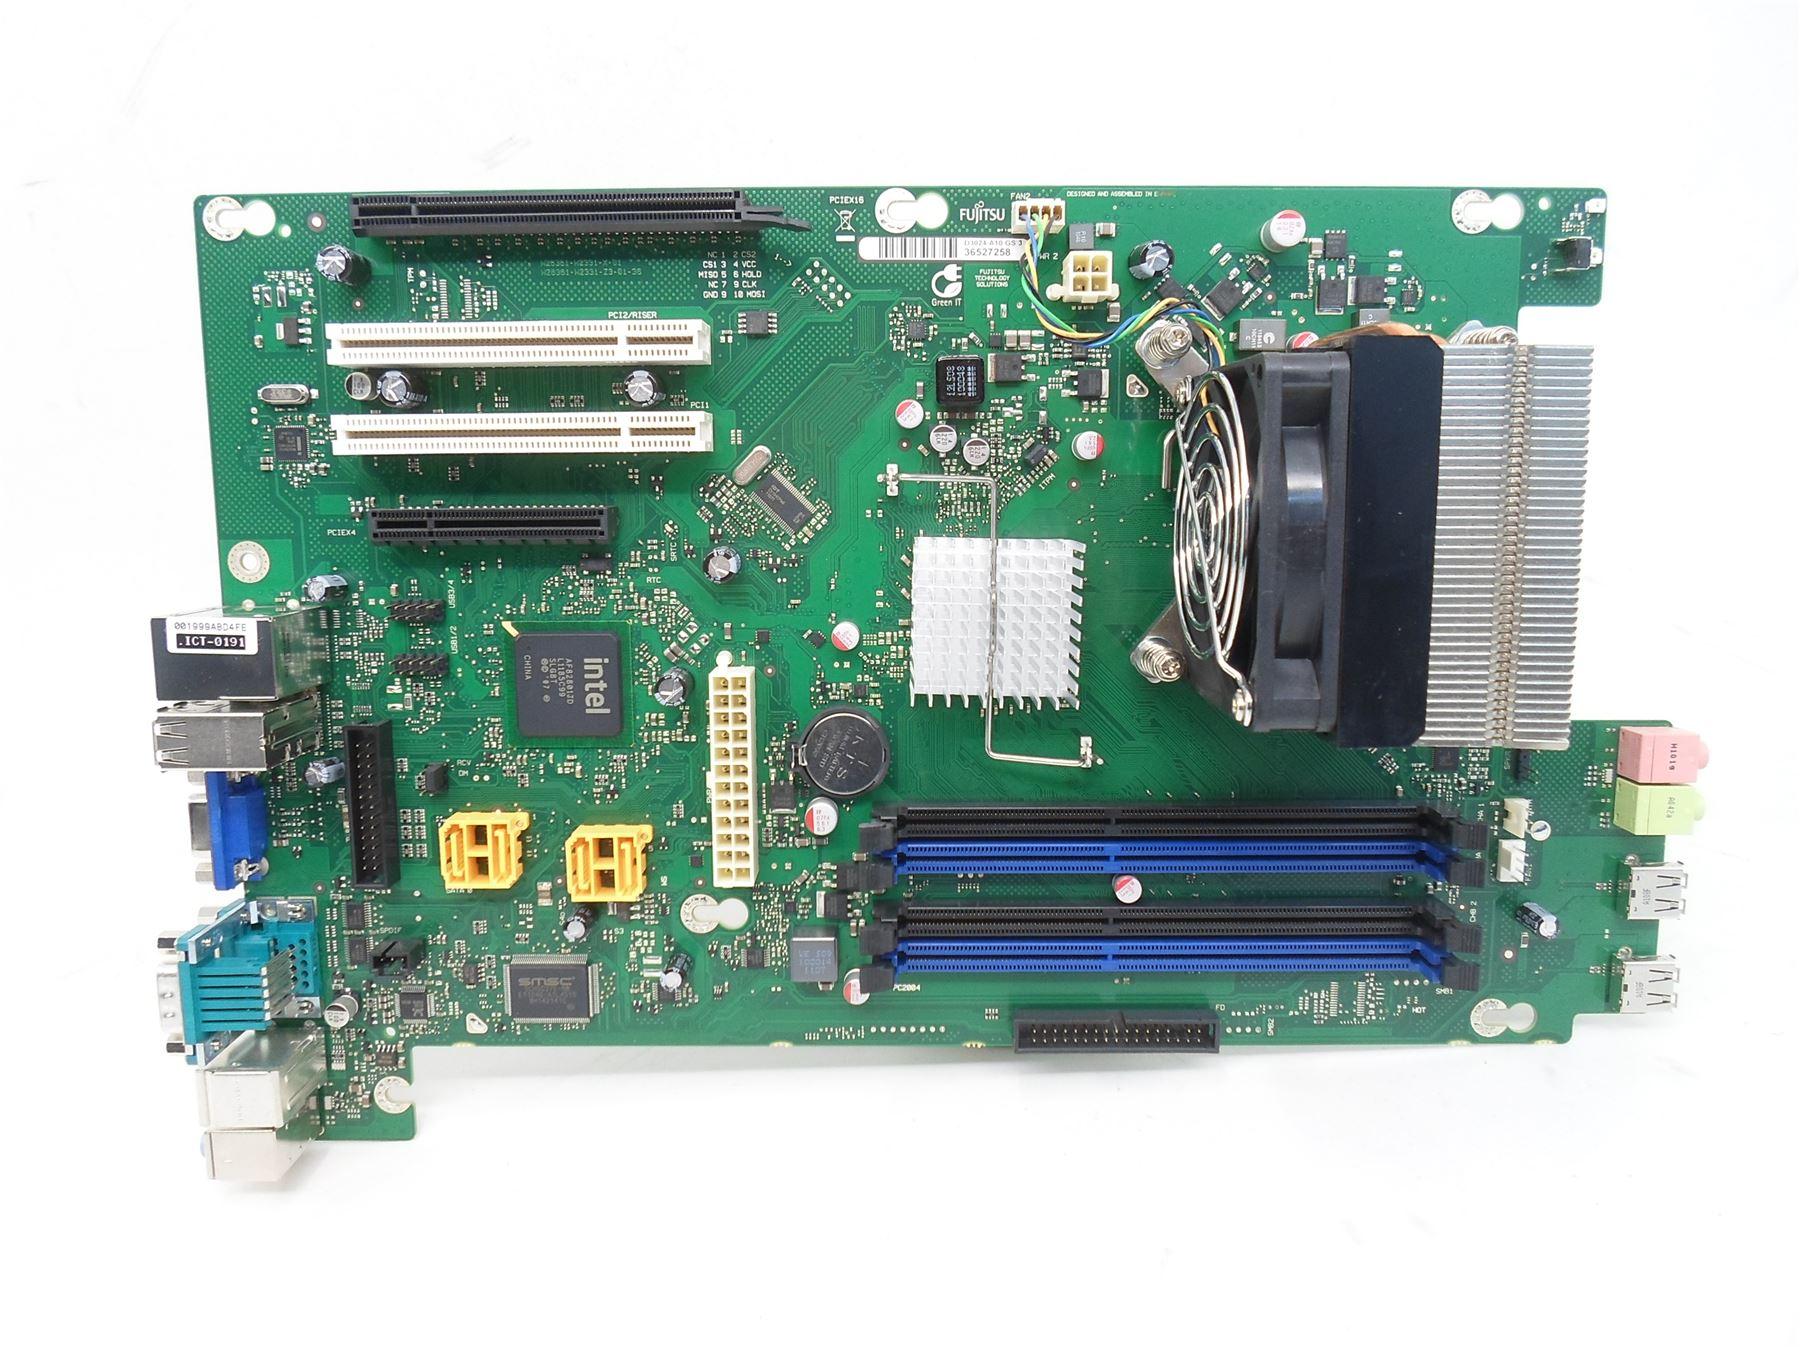 Intel 82801jb ich10